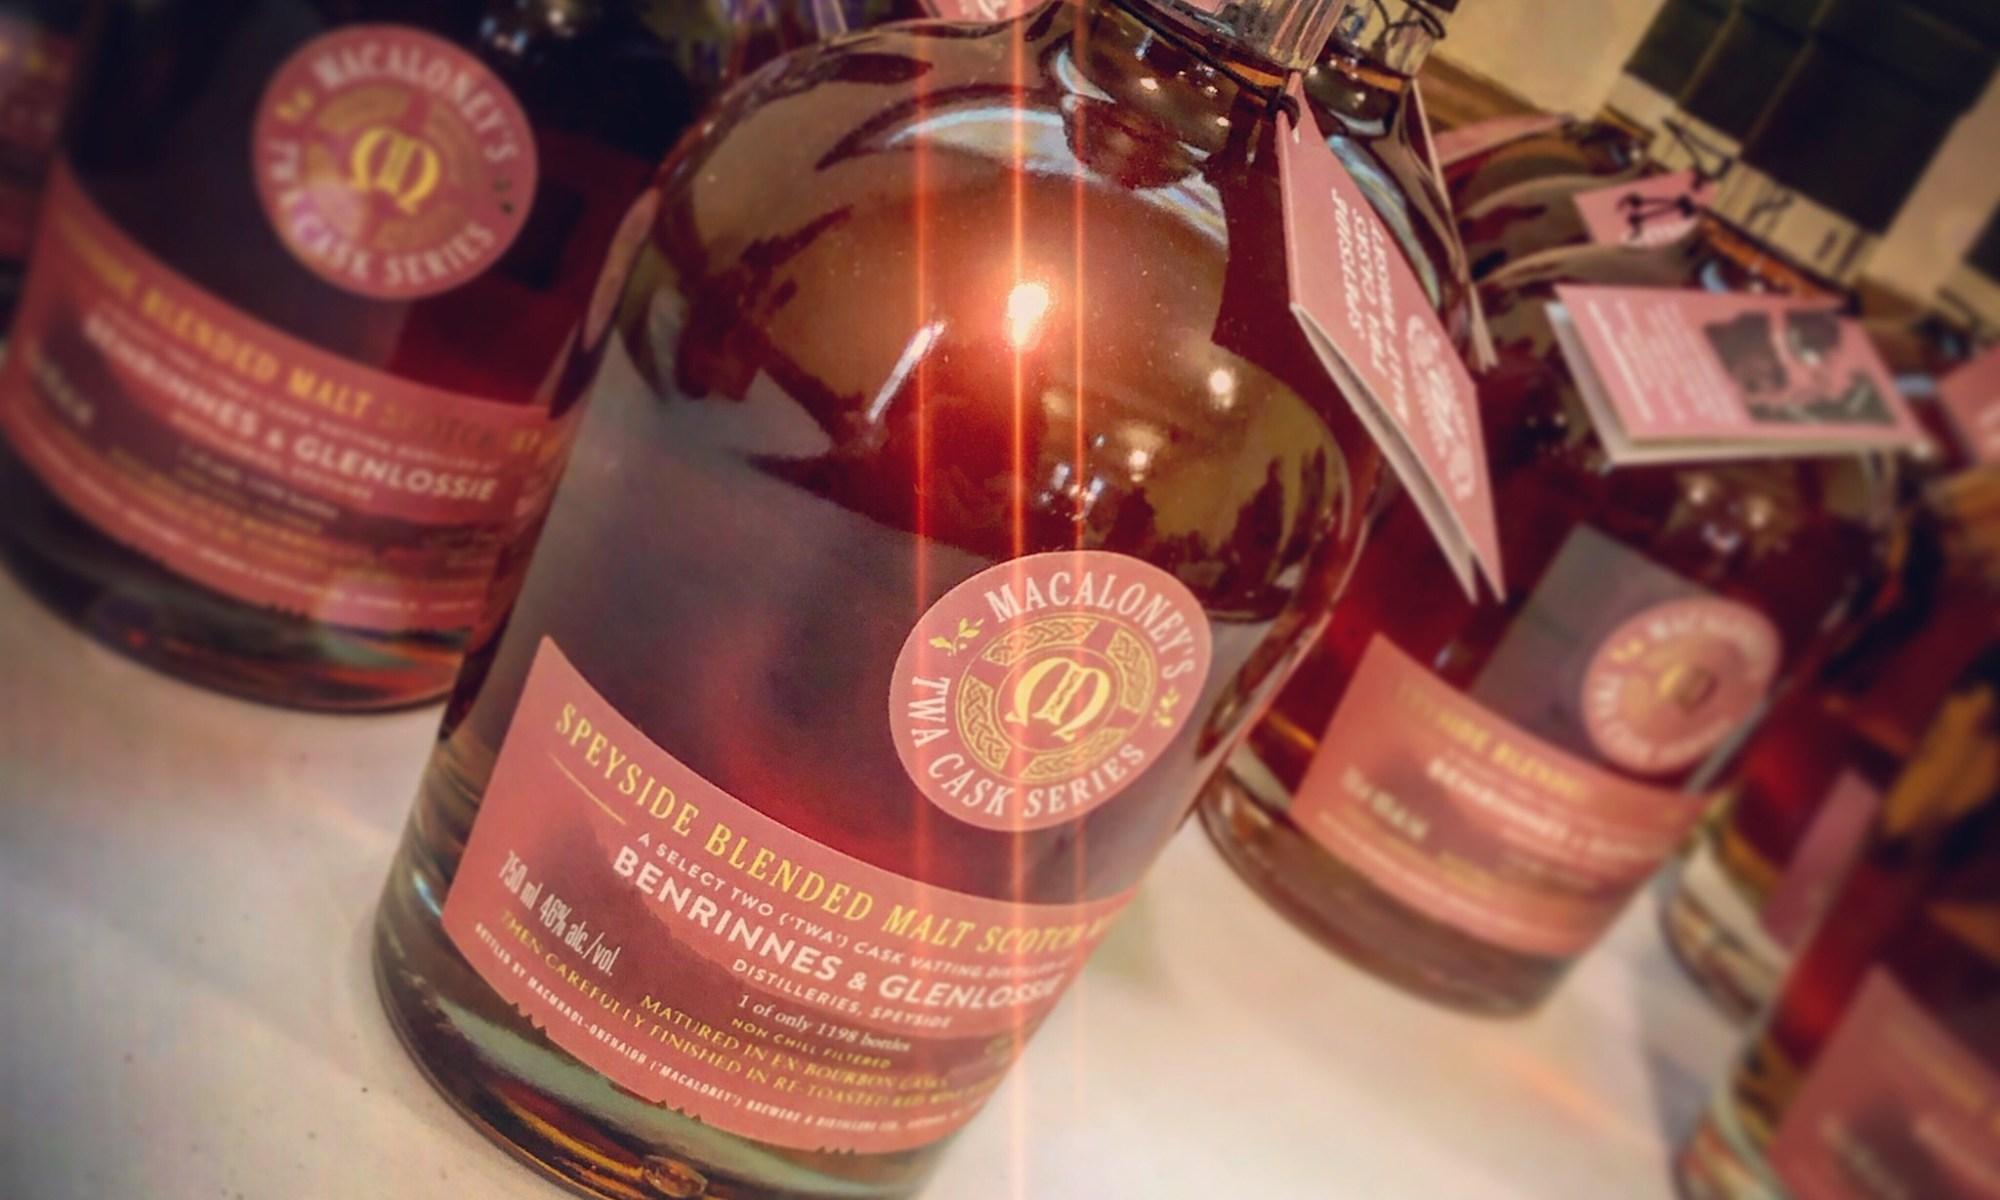 Vic Caledonian Blend Ex-Bourbon